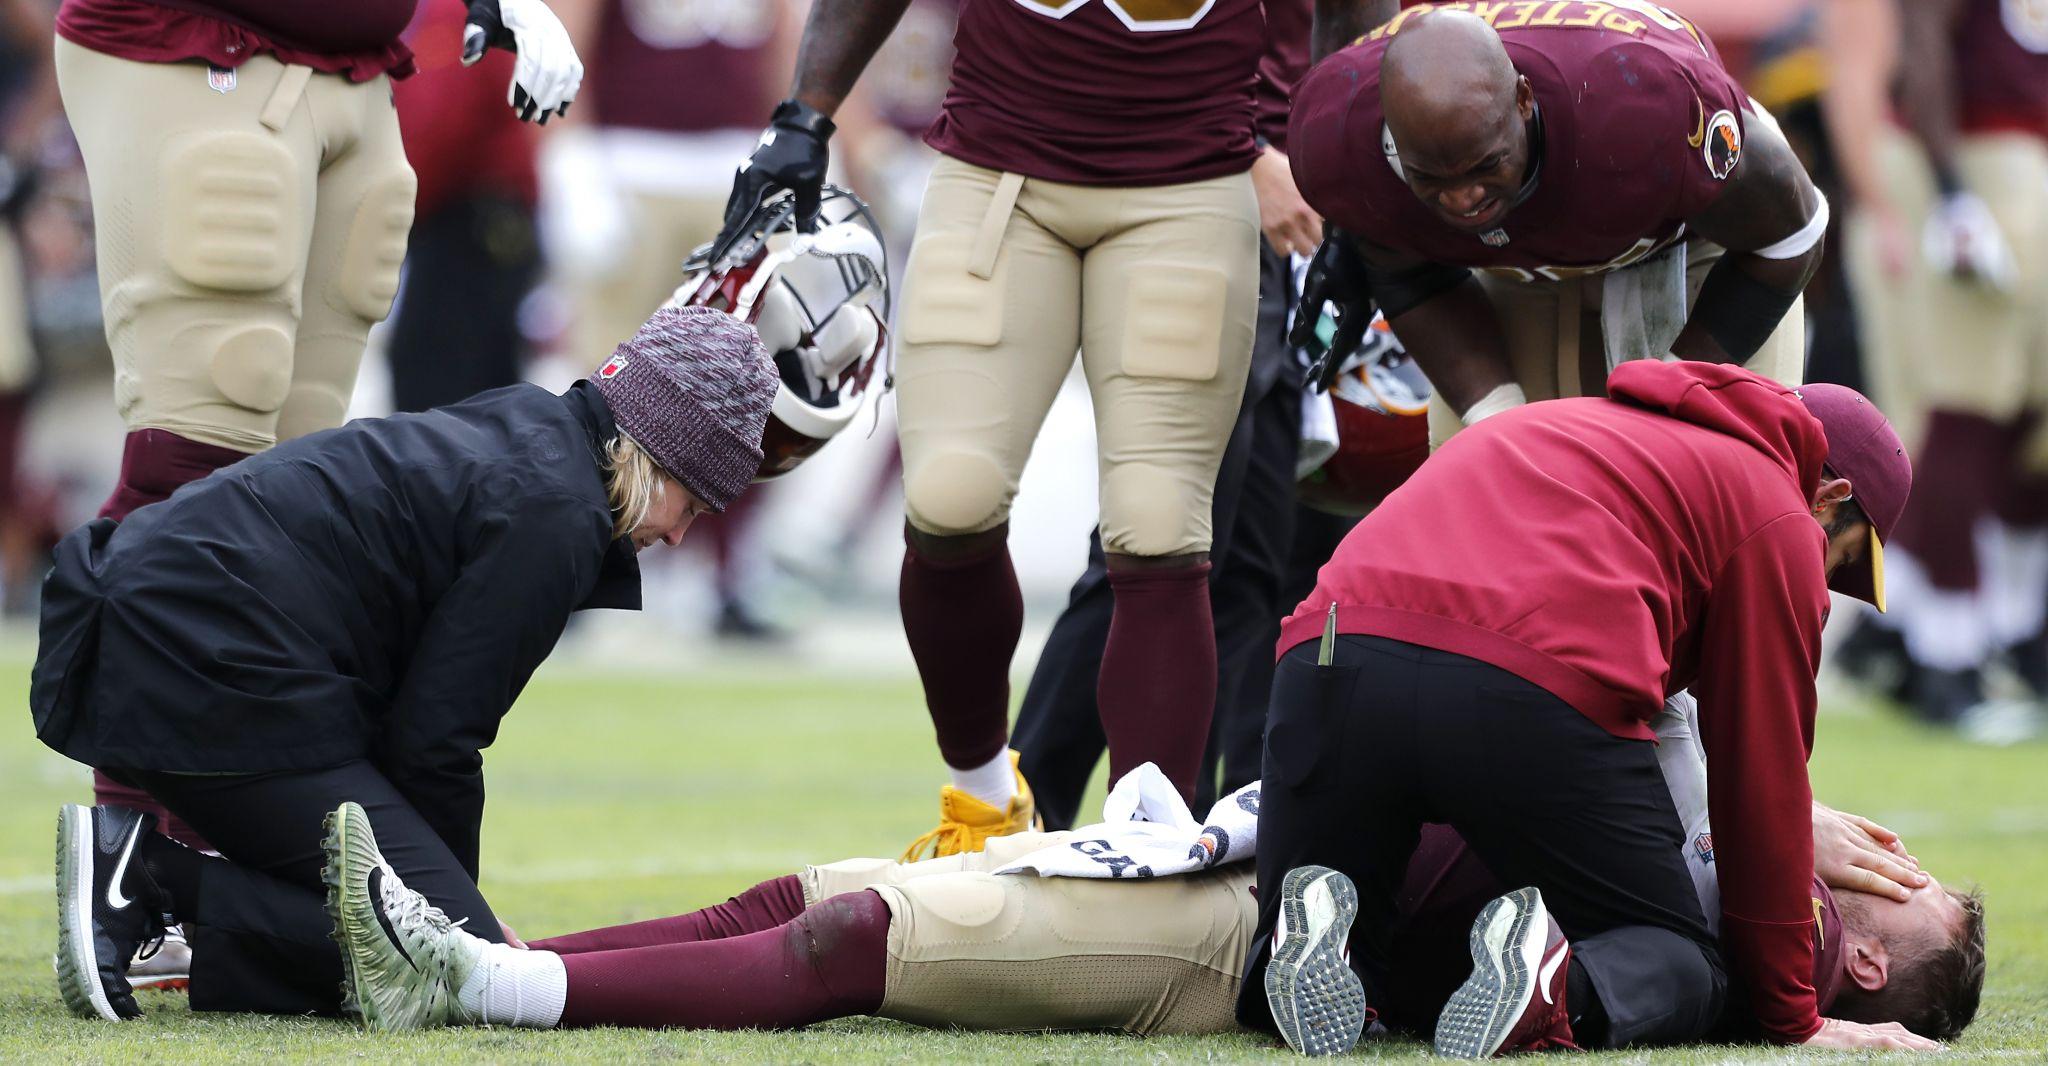 Washington Qb Alex Smith Suffers Gruesome Broken Leg Colt Mccoy Steps In